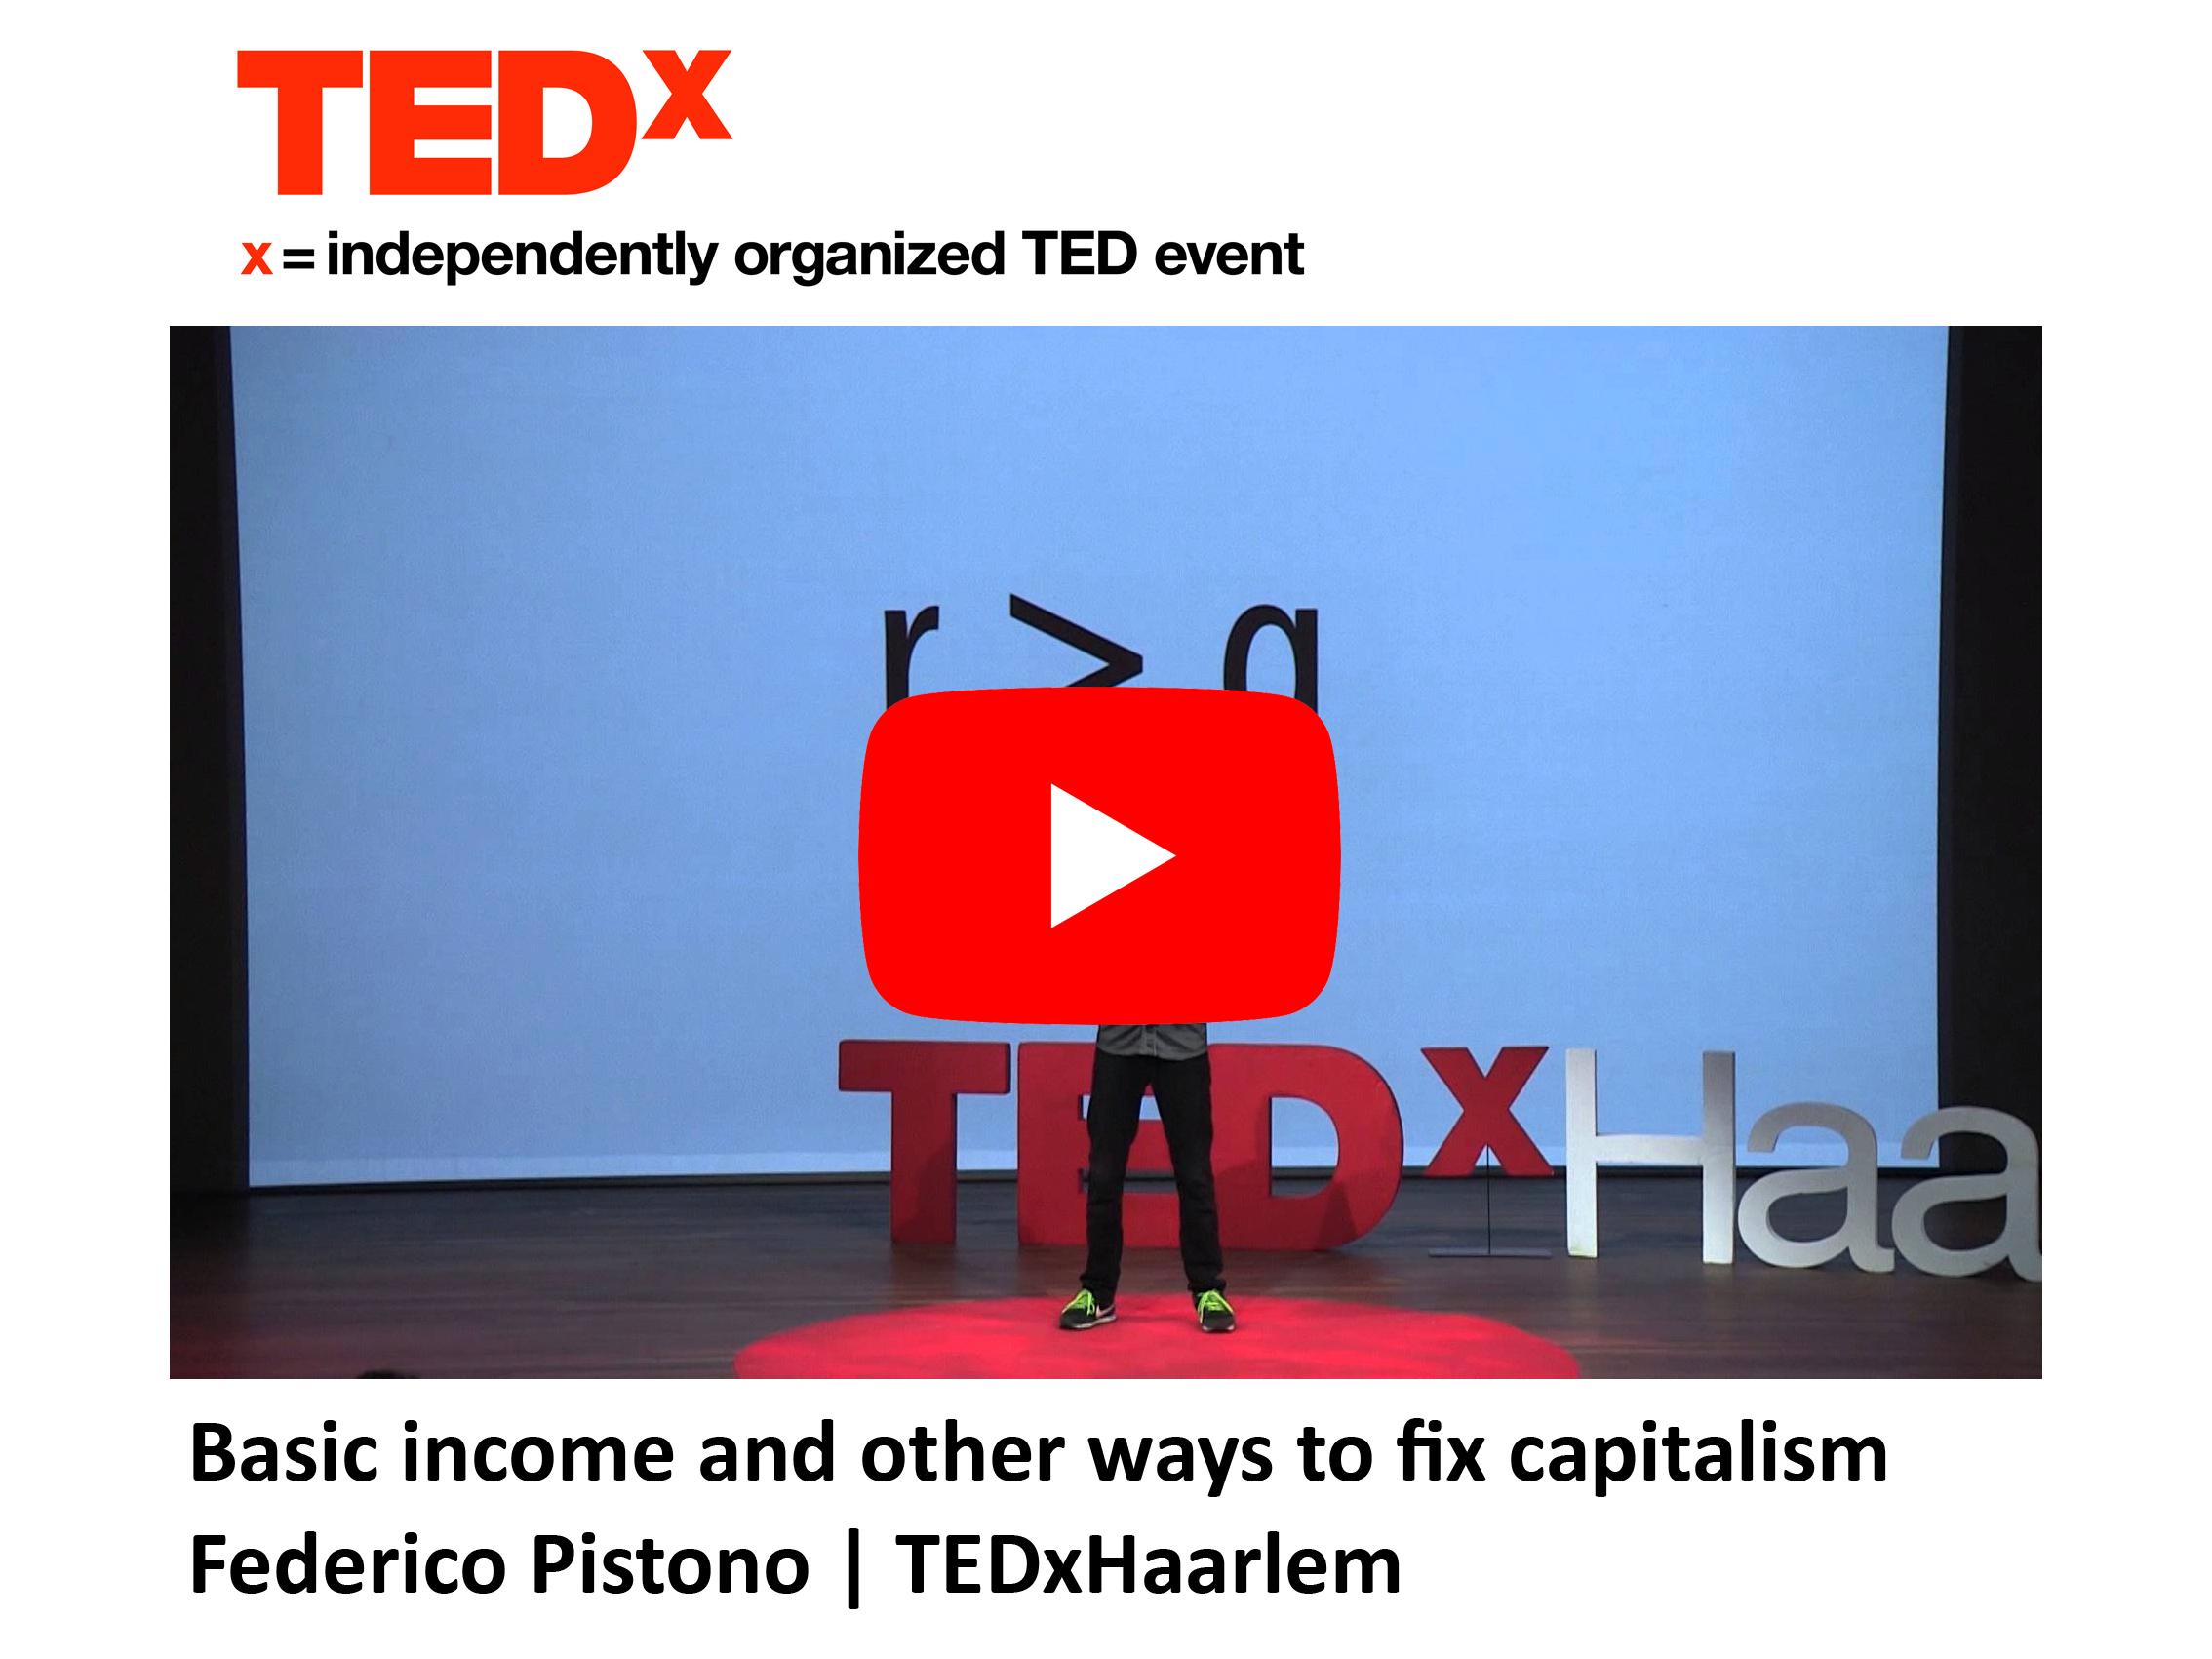 TEDx - UBI and other ways to fix capitalism